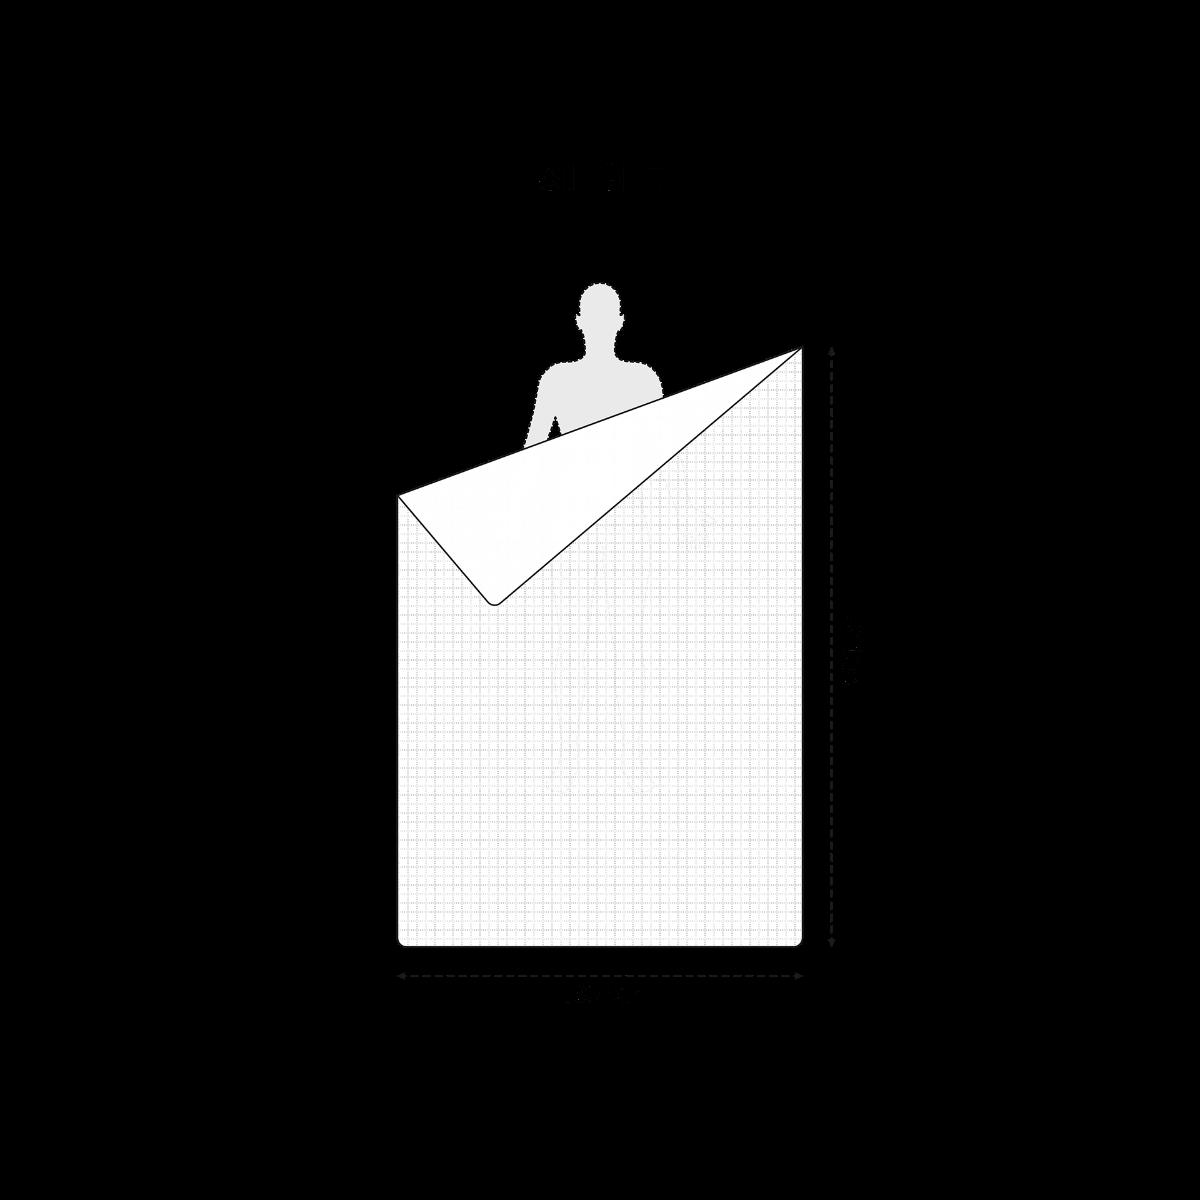 Single Duvet Cover Dimensions